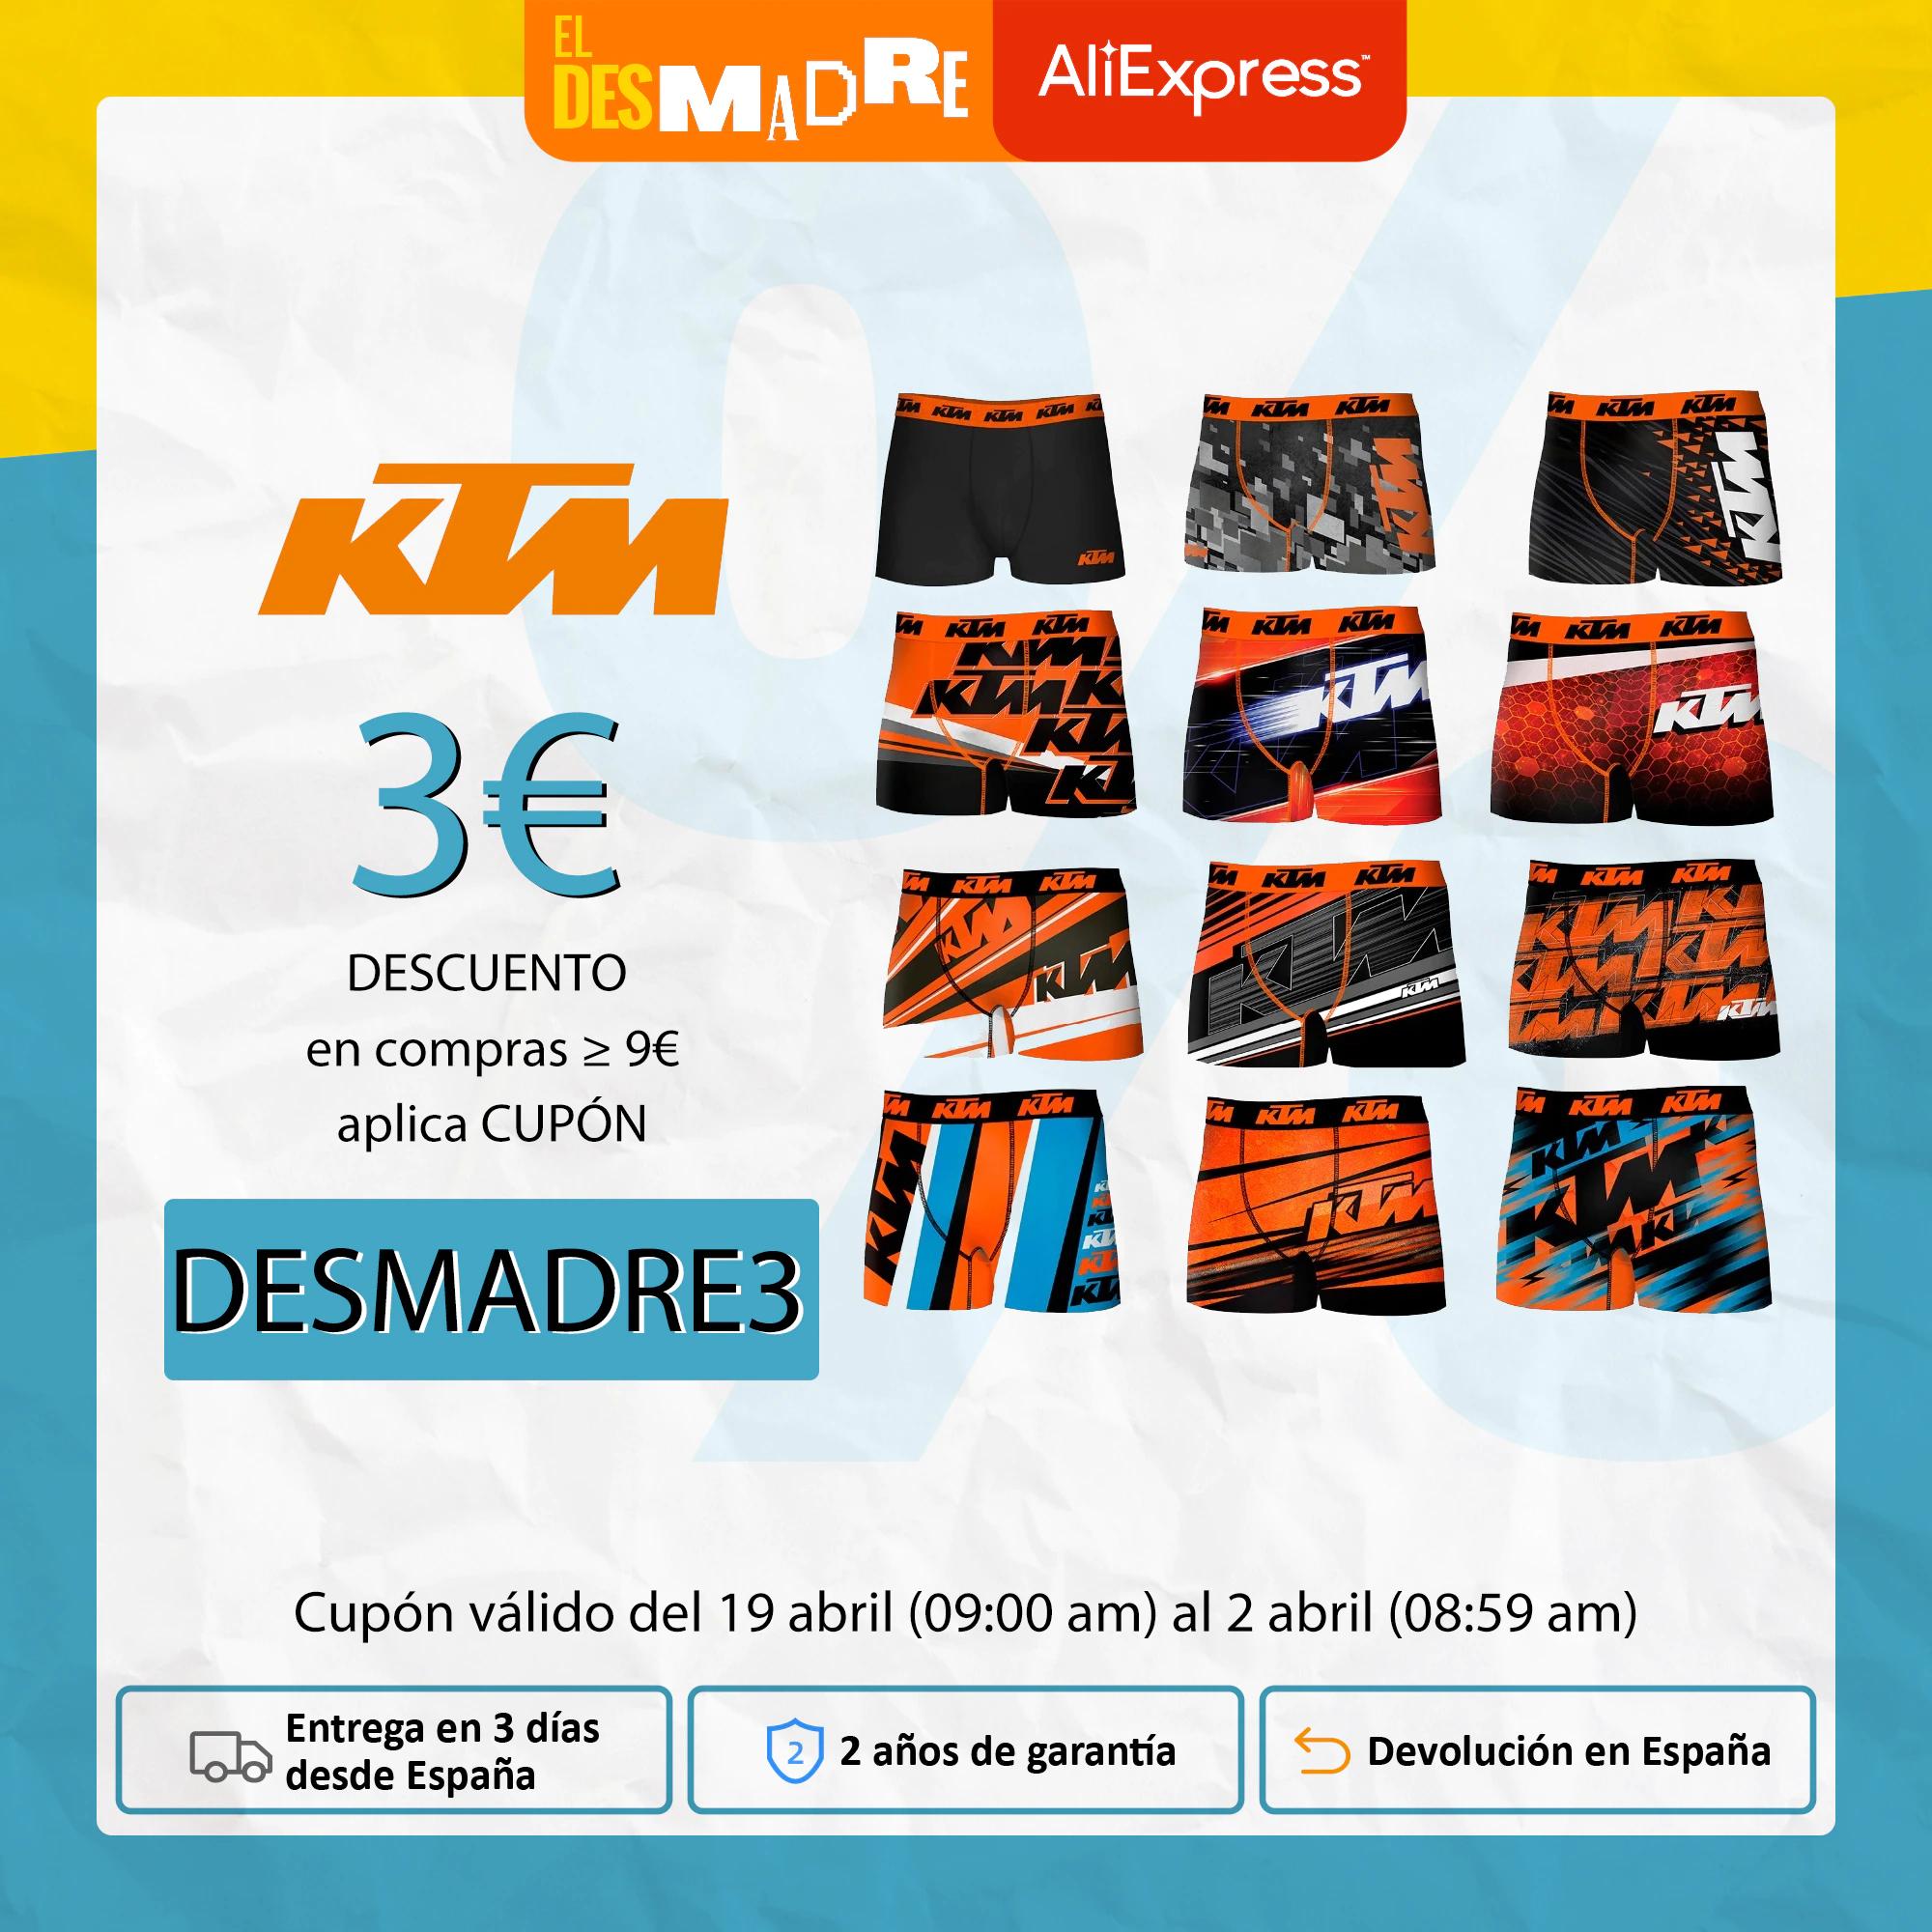 Calzoncillos KTM microfibra a 7€!